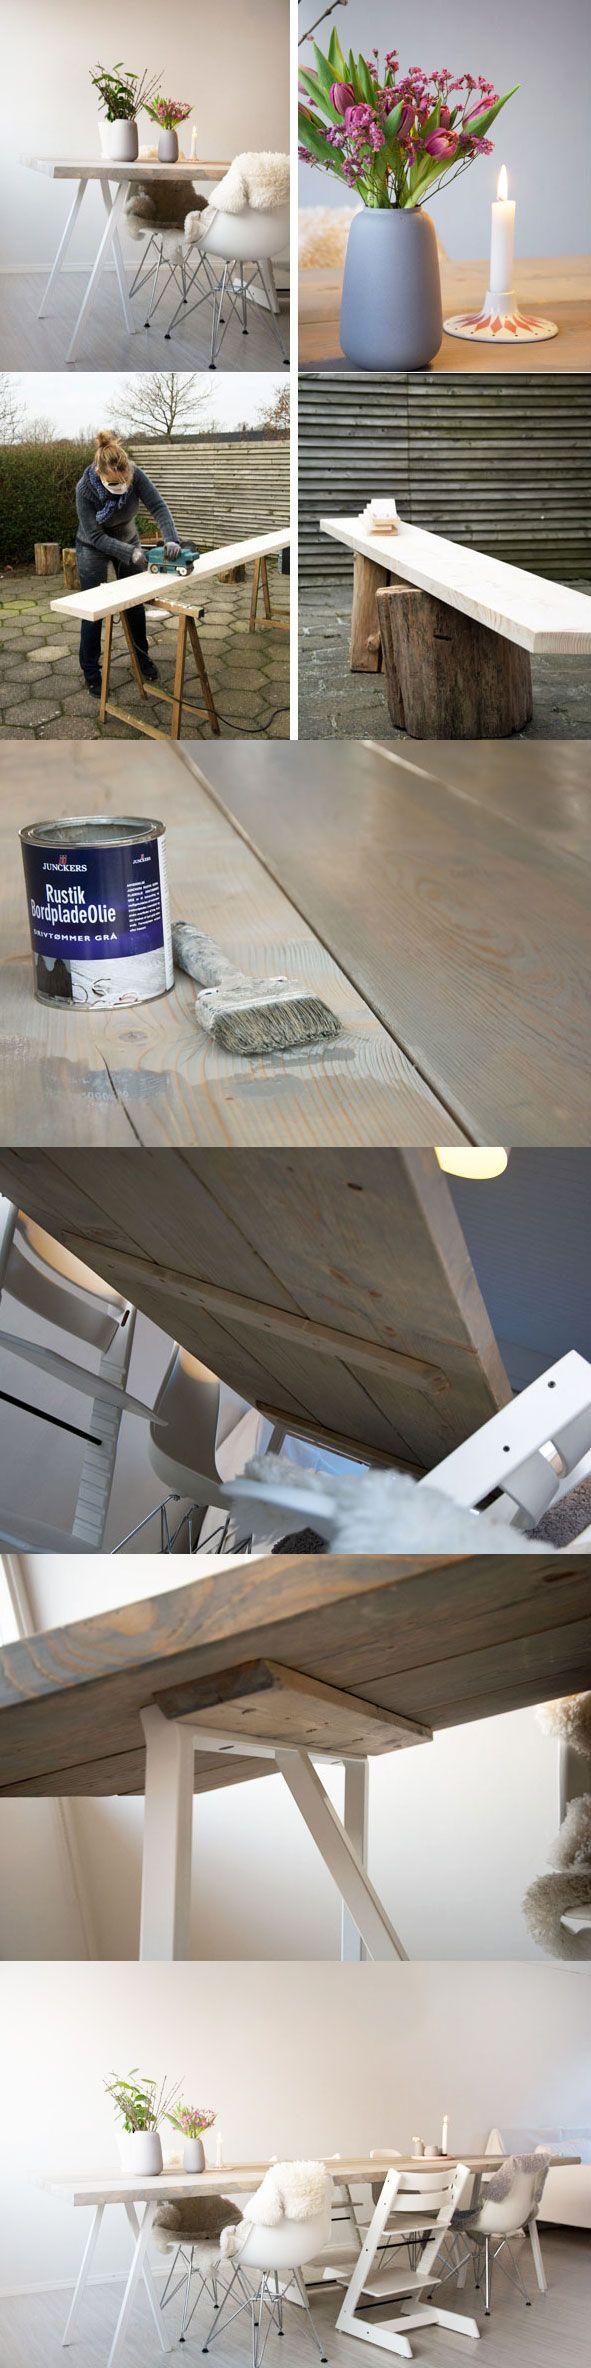 DIY dining table IKEA Lerberg hack